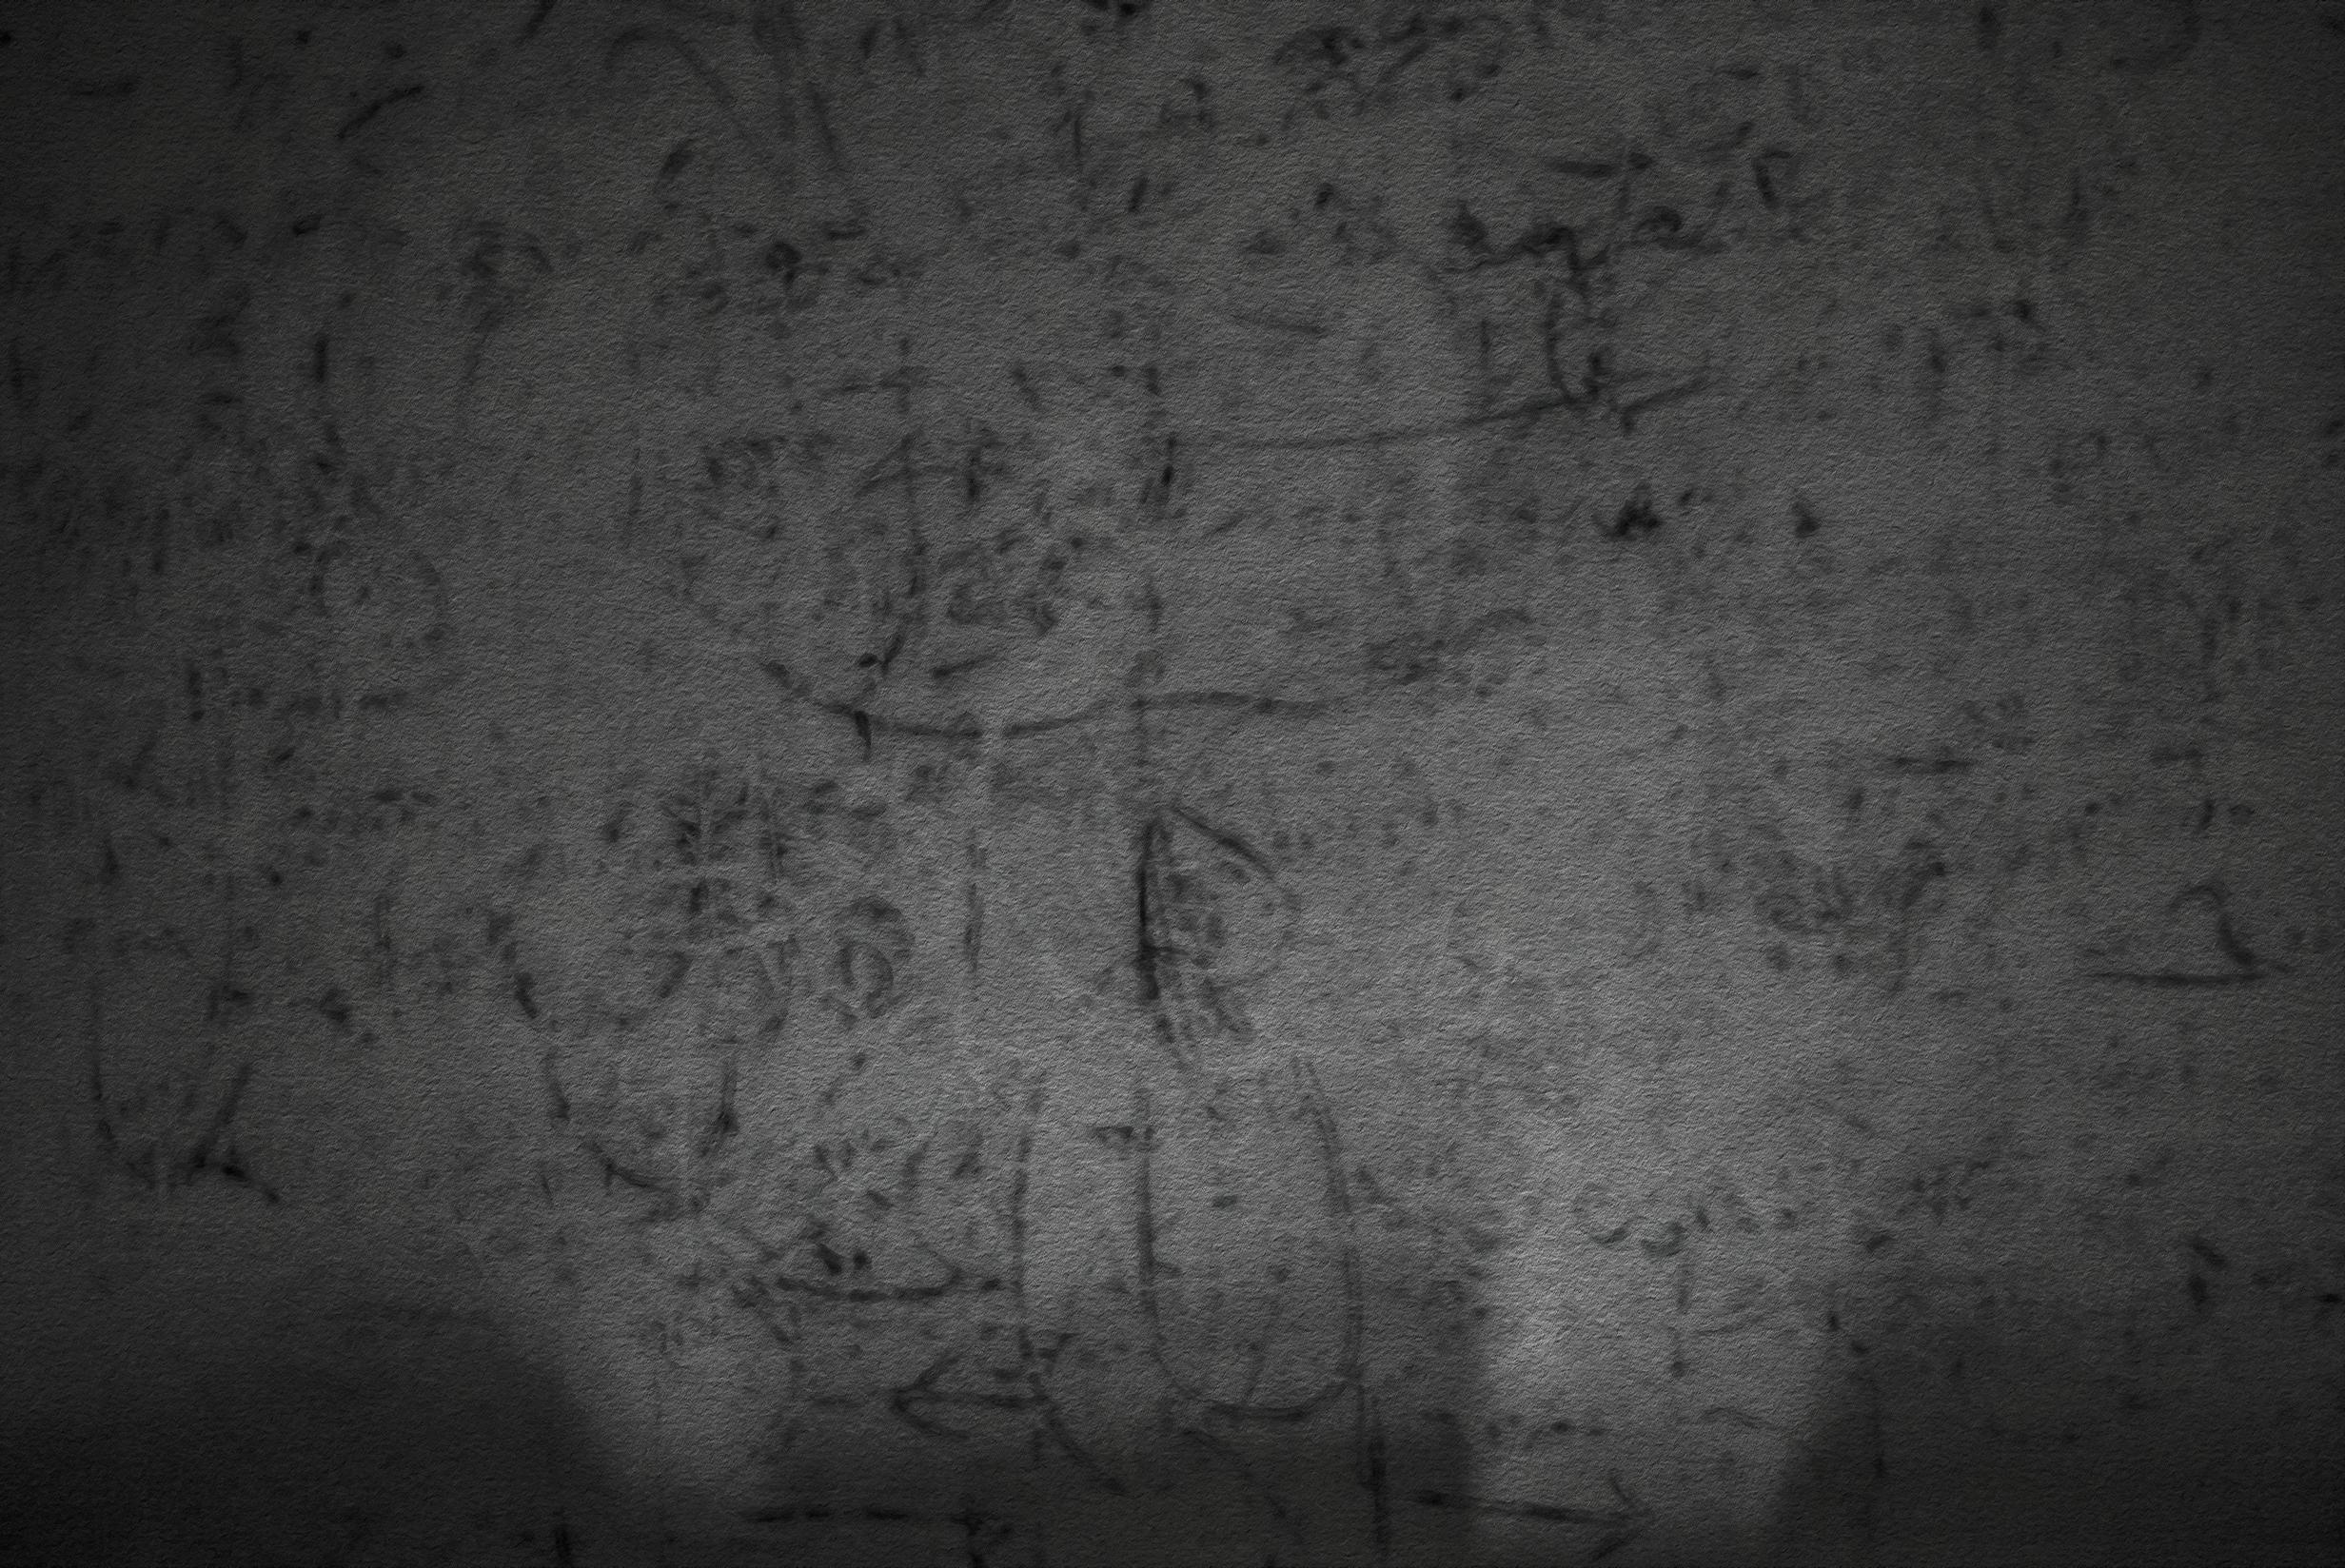 Memory (Palimpsest)